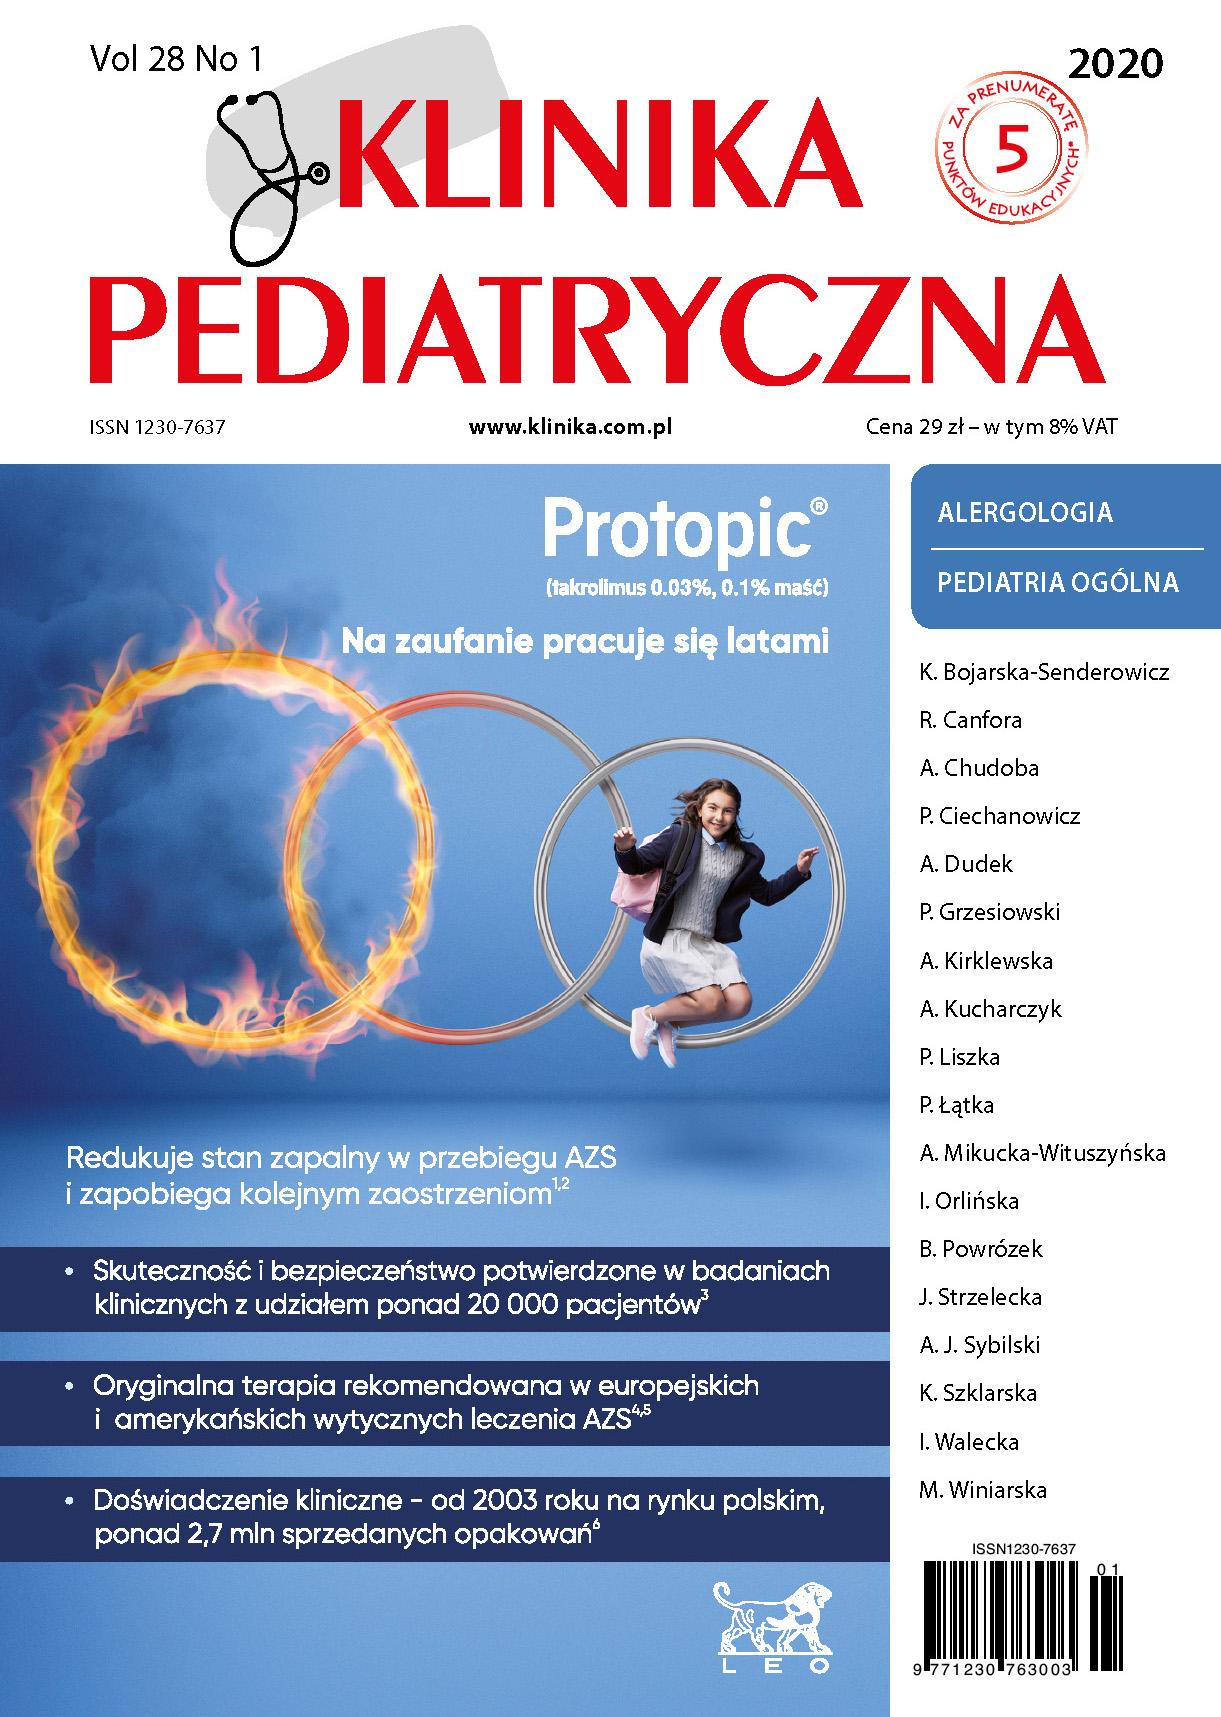 KP1/2020 Alergologia/Pediatria ogólna